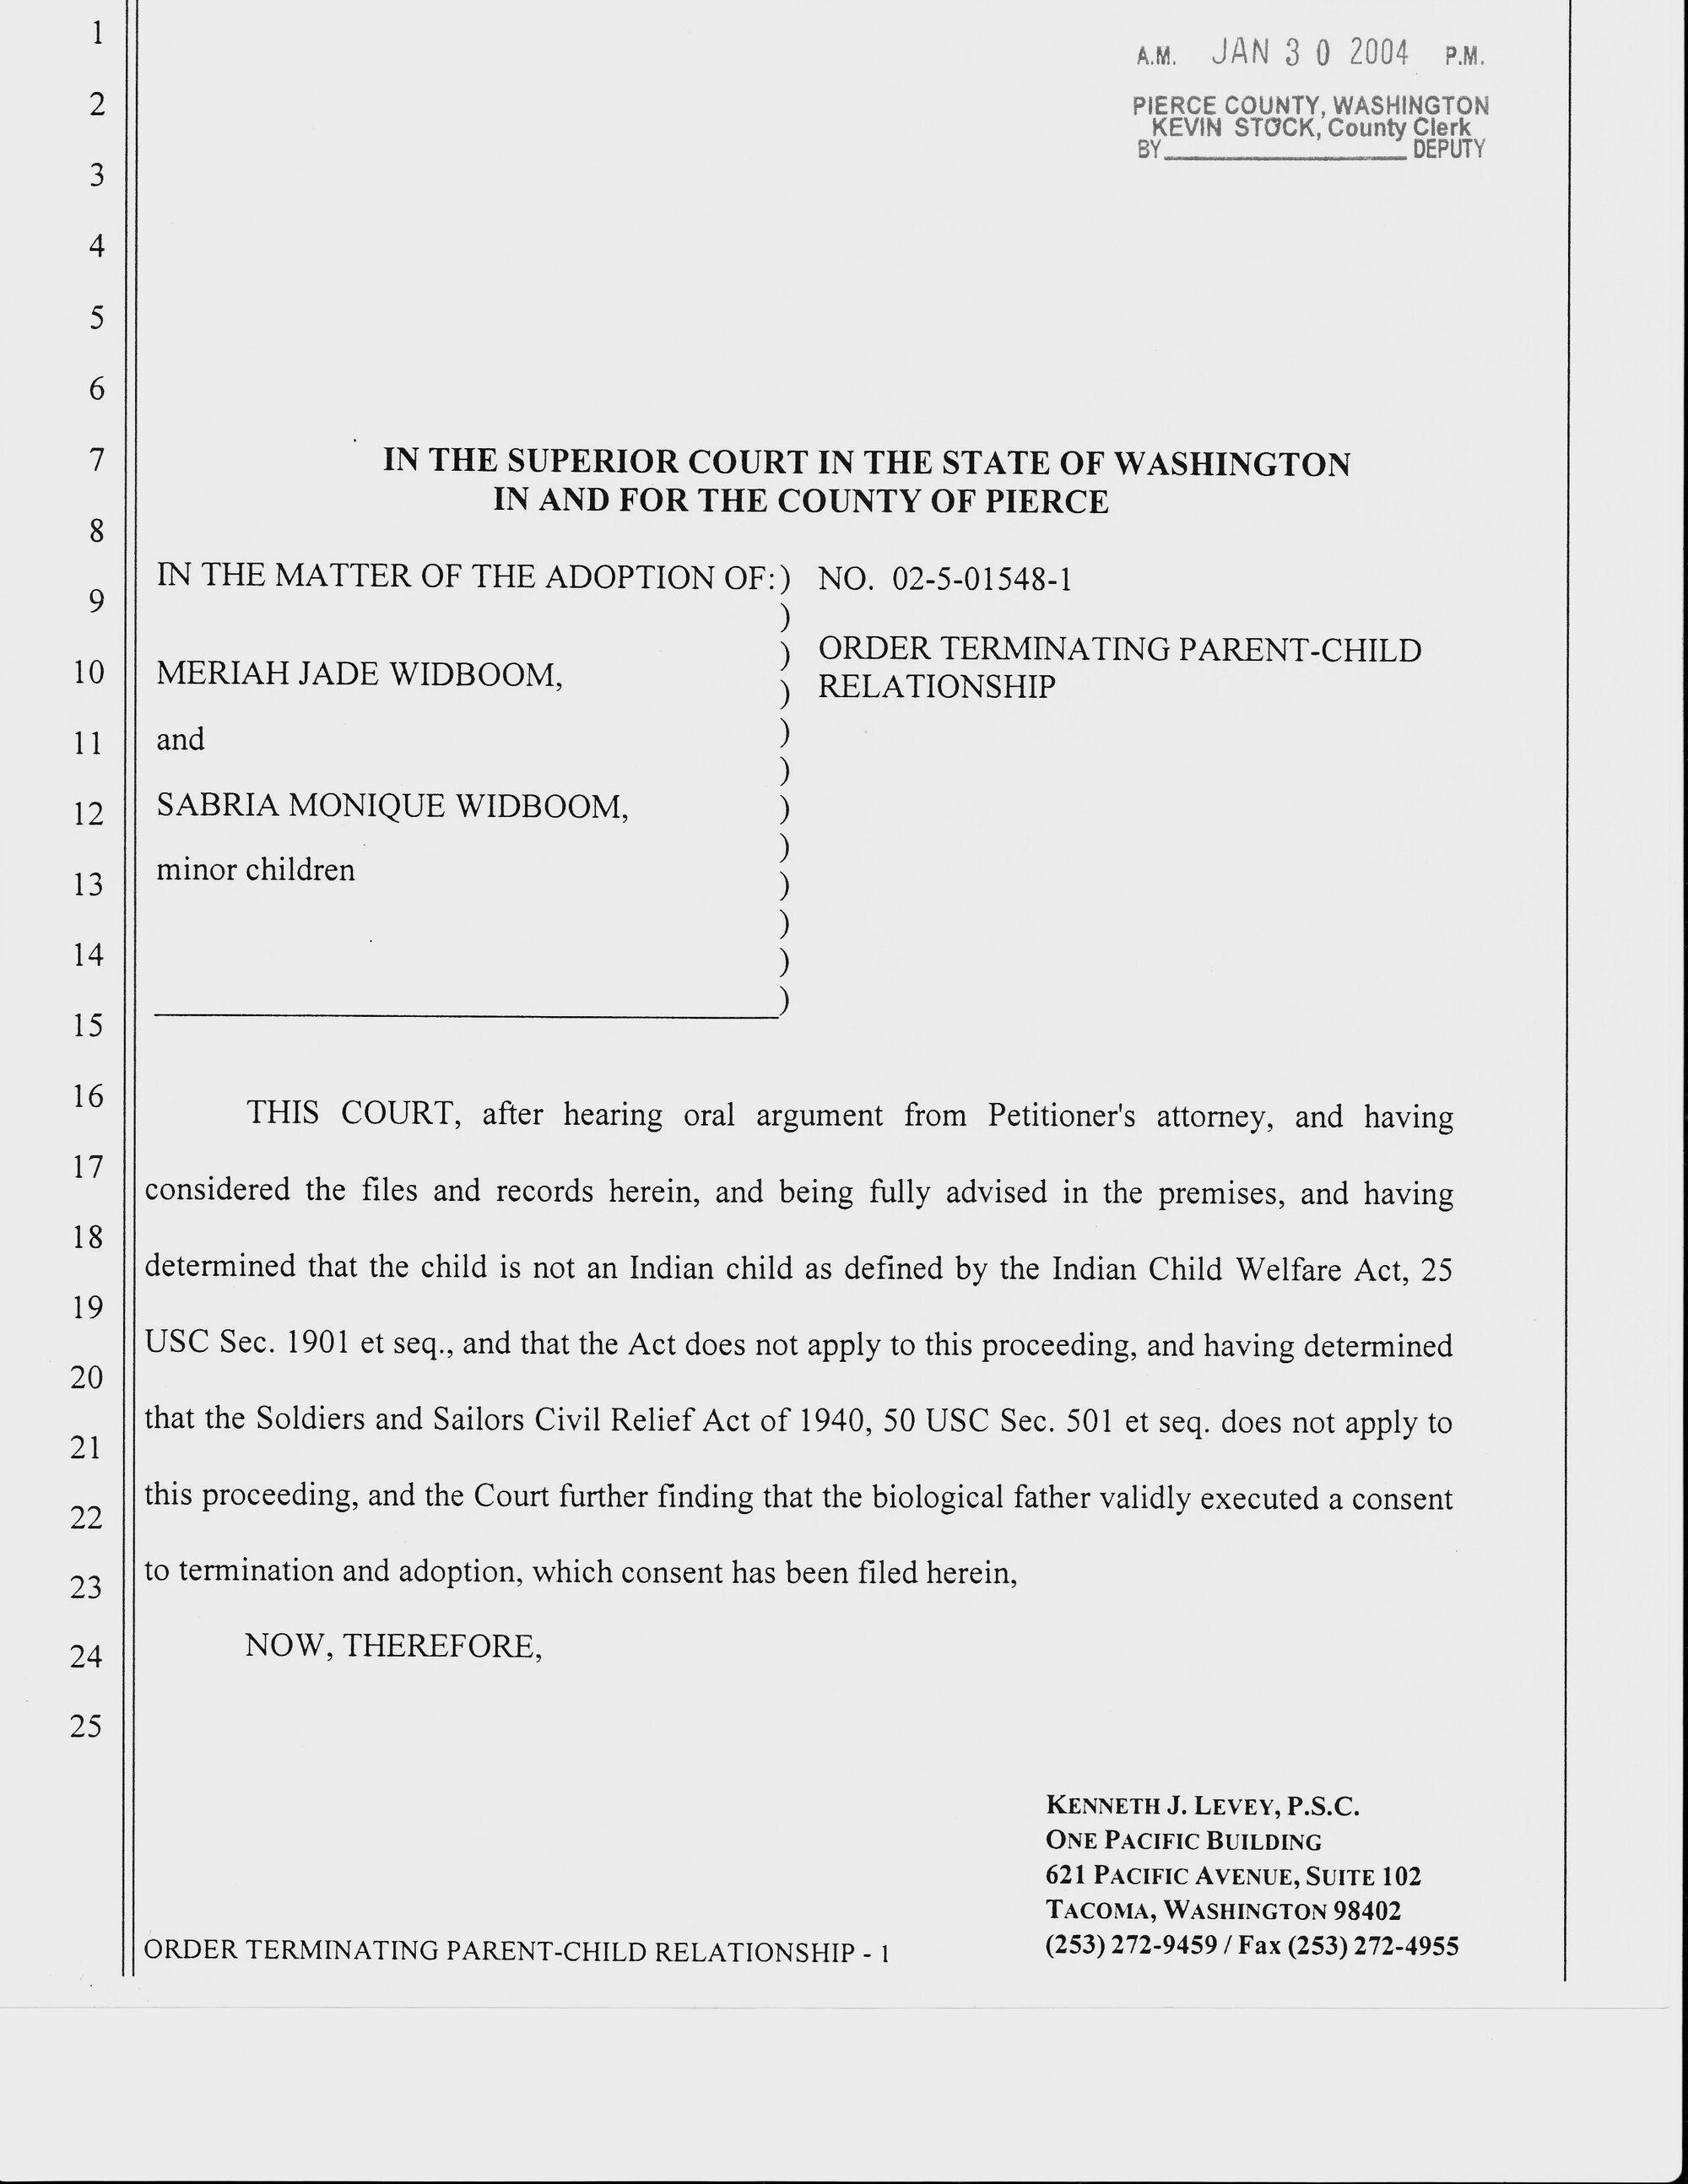 Image - Brian Widboom Termination Parental Rights Order jpg